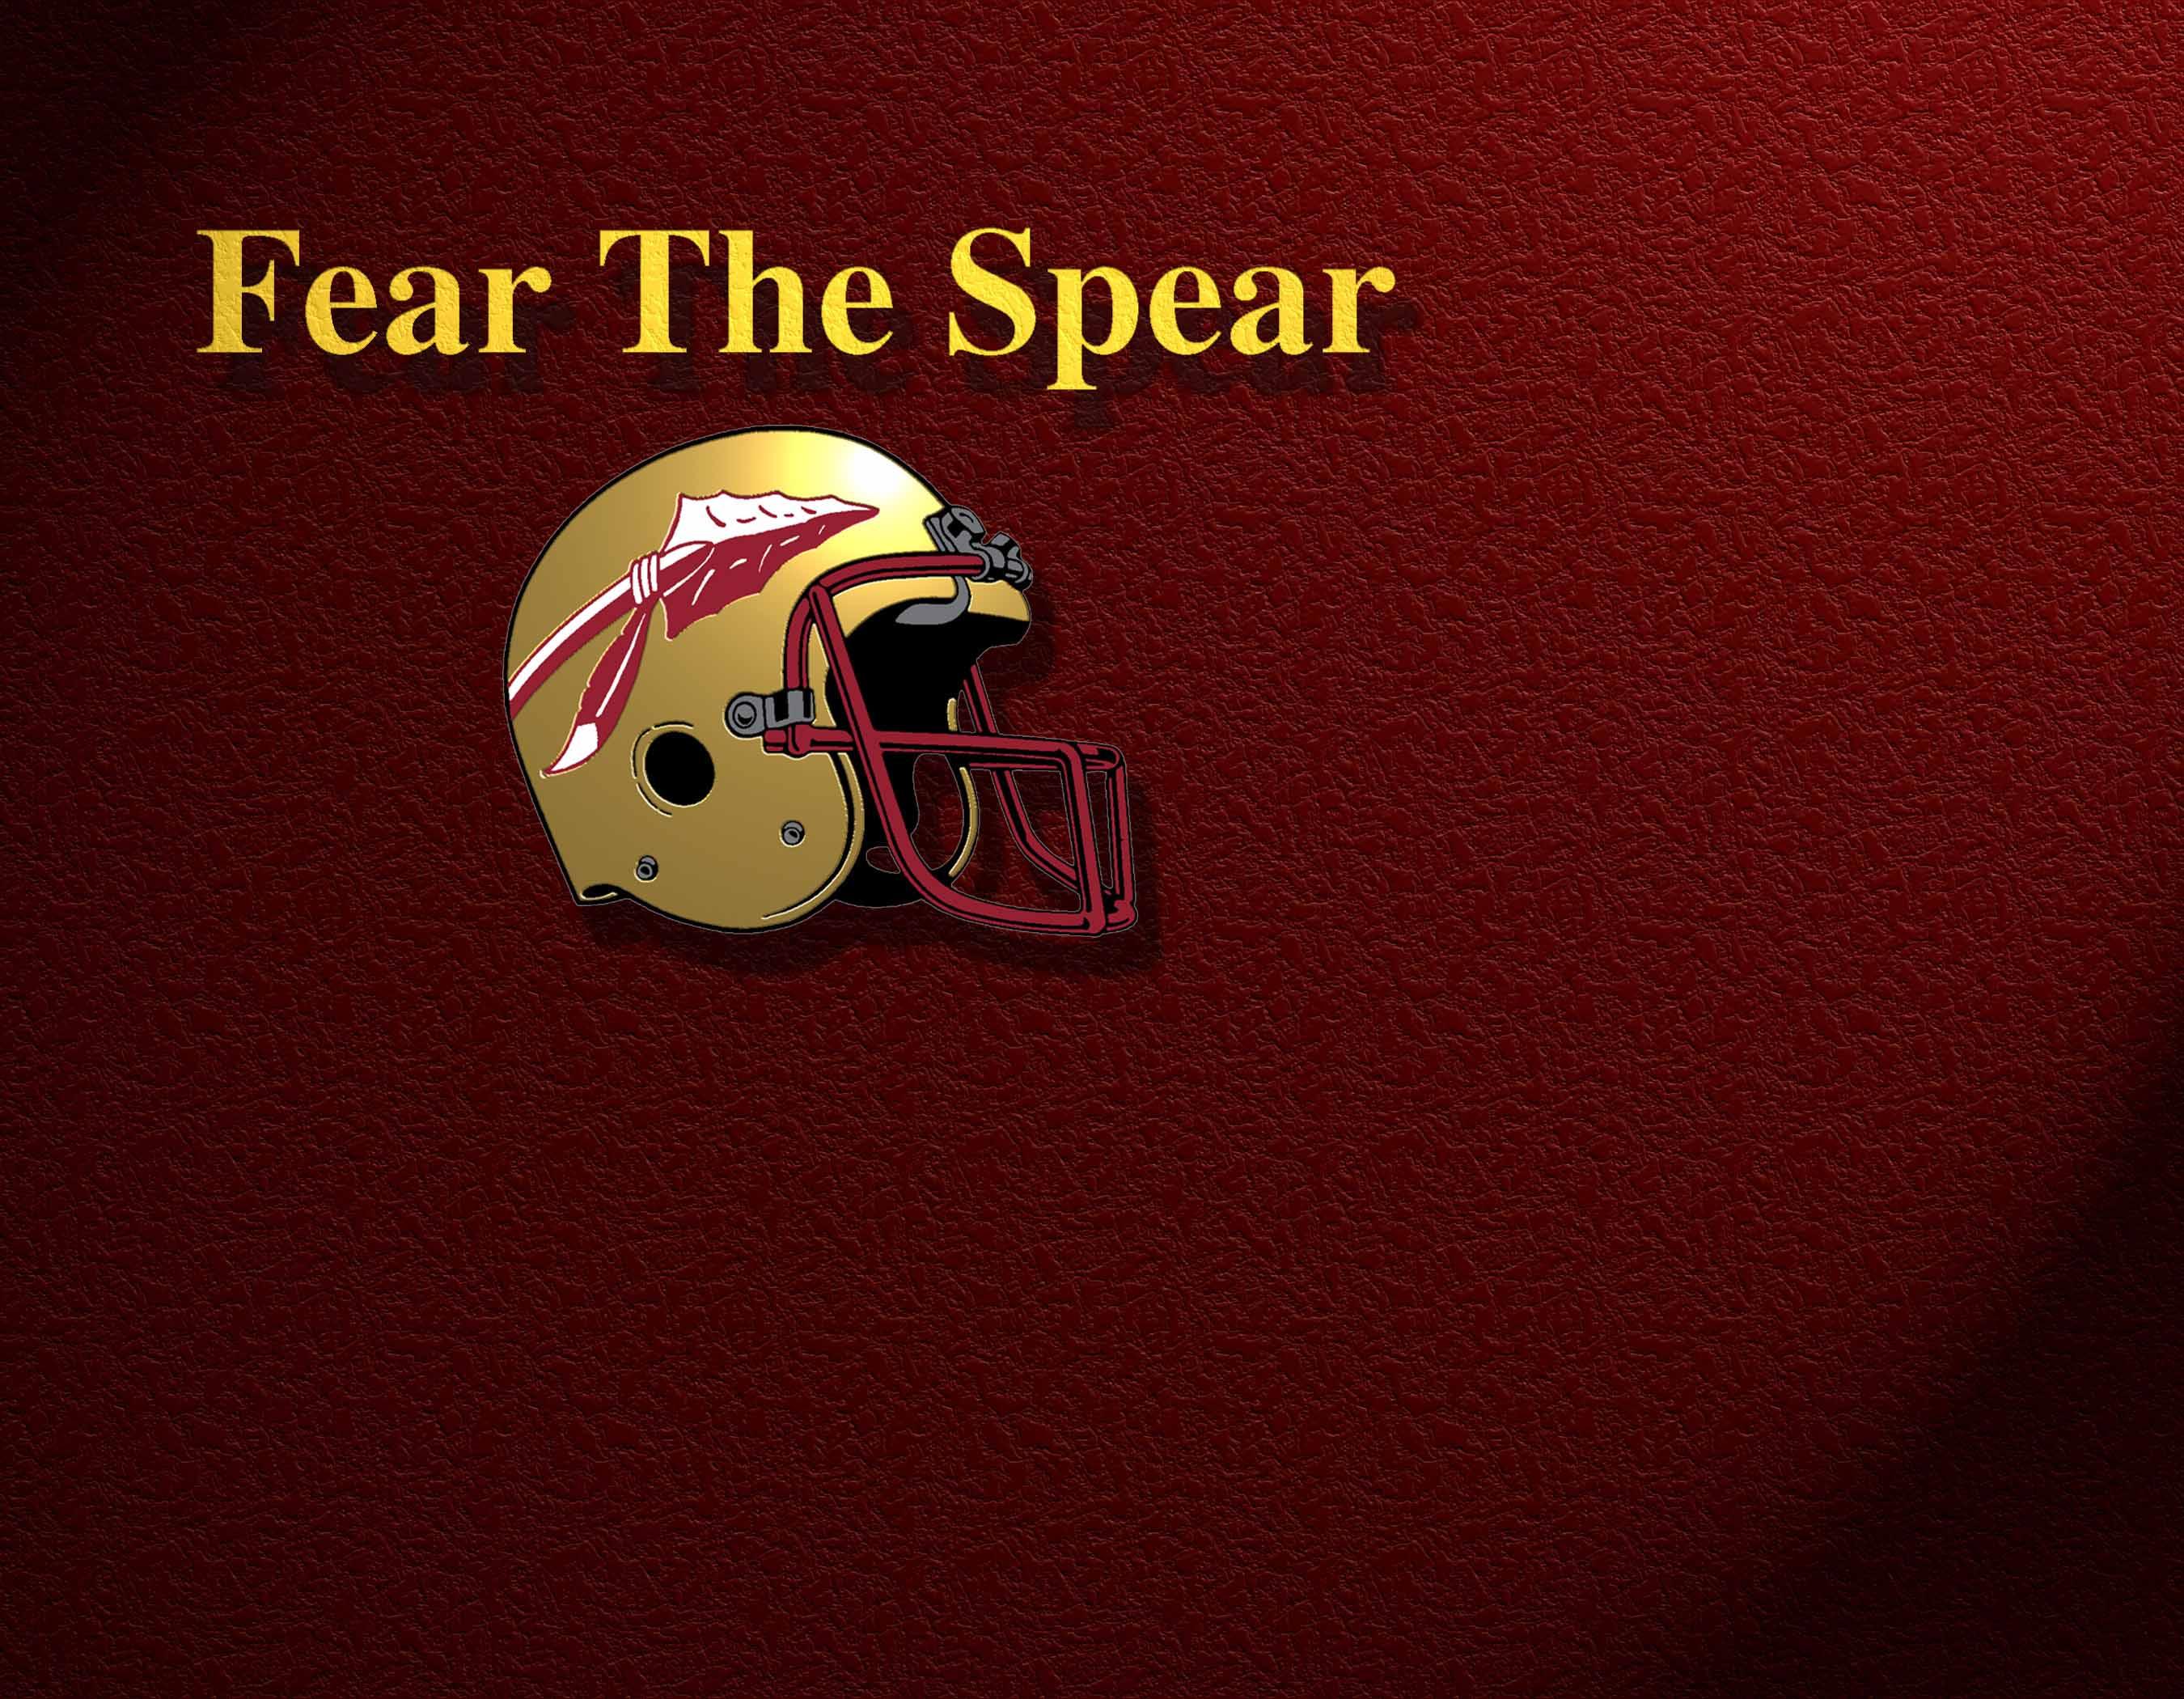 FORIDA STATE SEMINOLES College Football 7 JPG Wallpaper